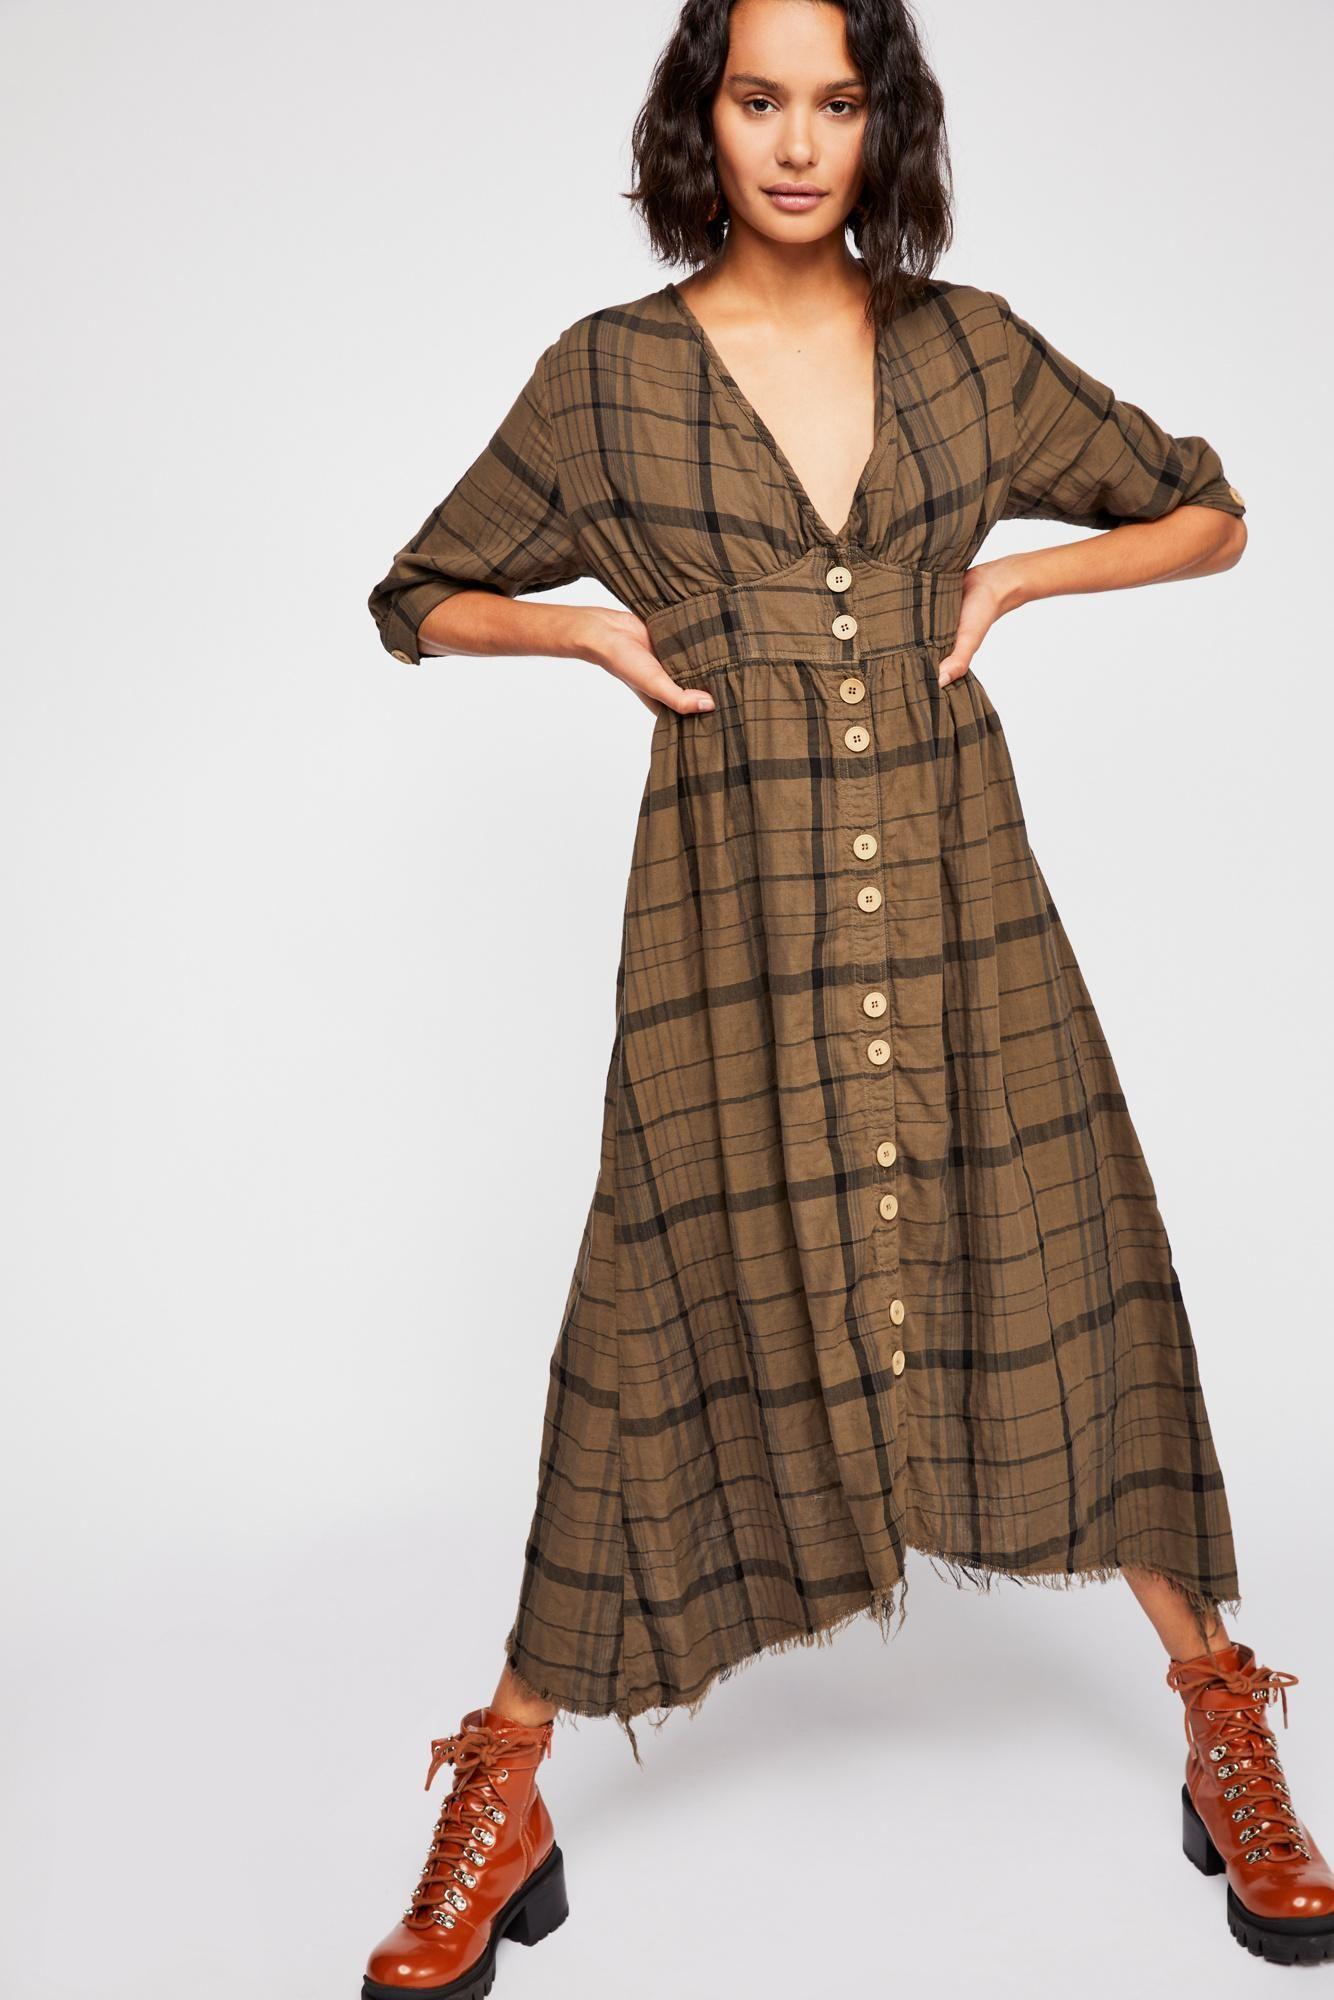 4baf44dab6 Lyst - Free People Laura Plaid Midi Dress By Cp Shades in Brown